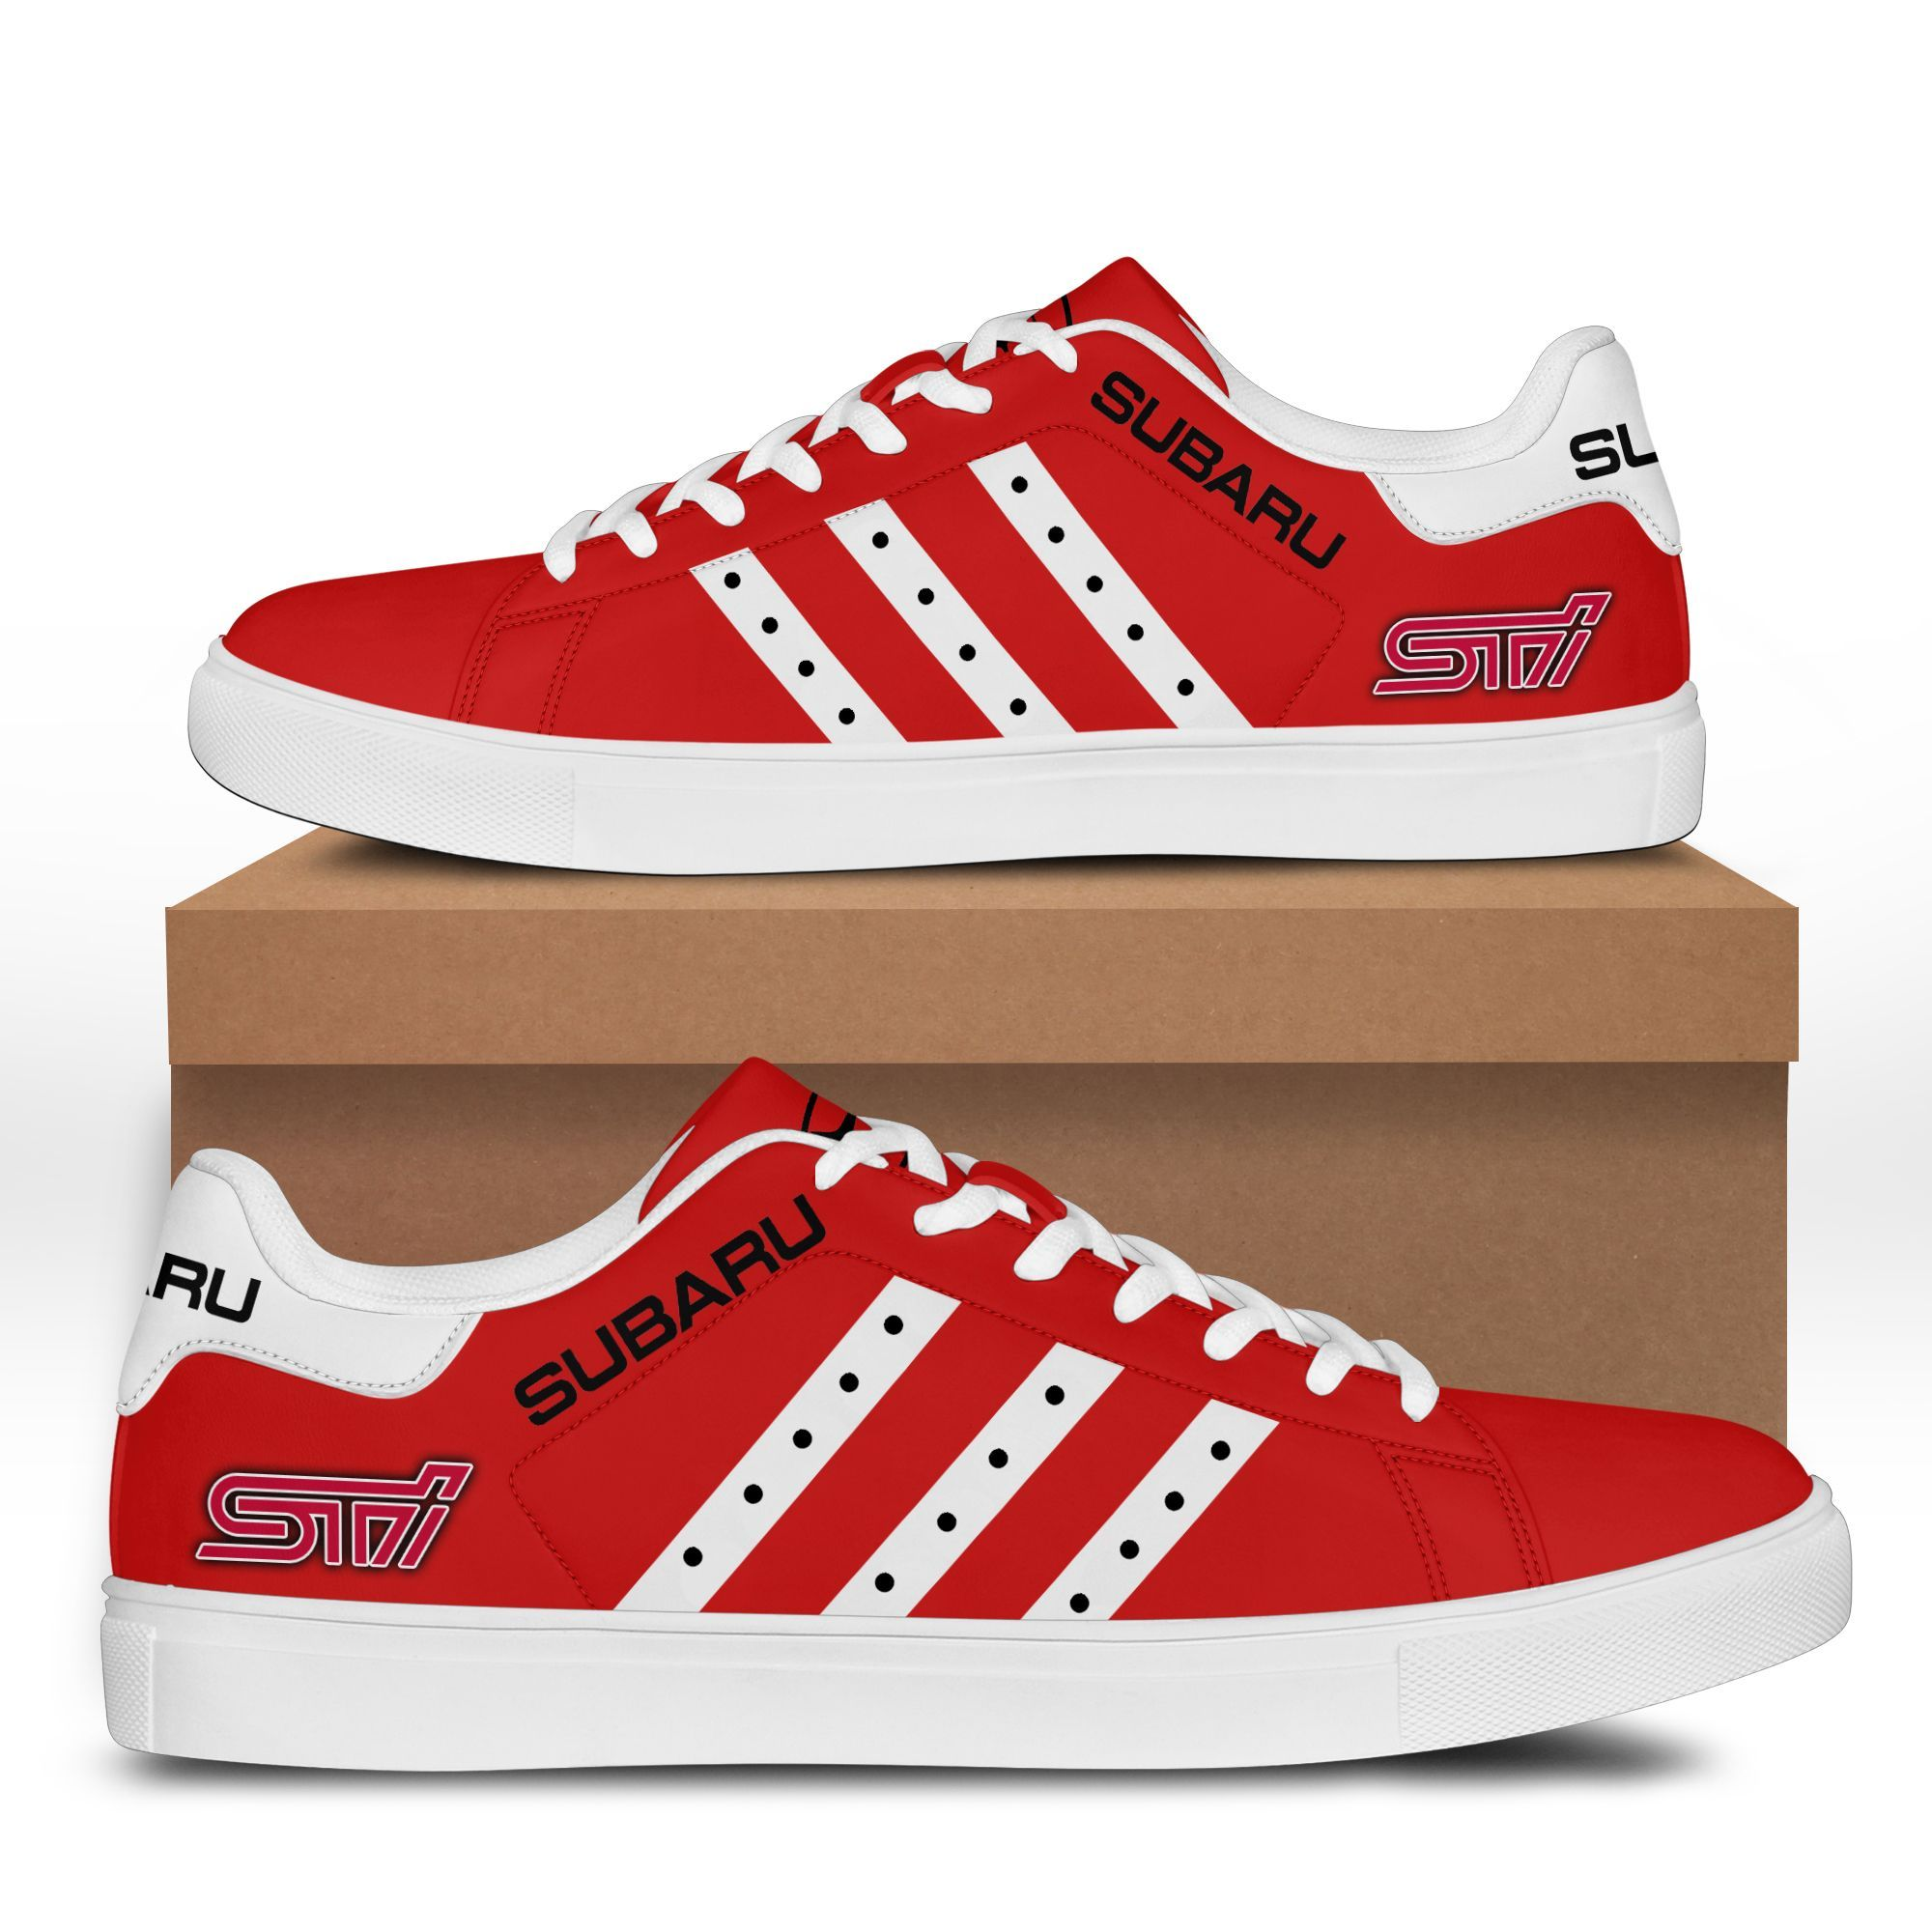 SUBARU STI Red Stan Smith Shoes